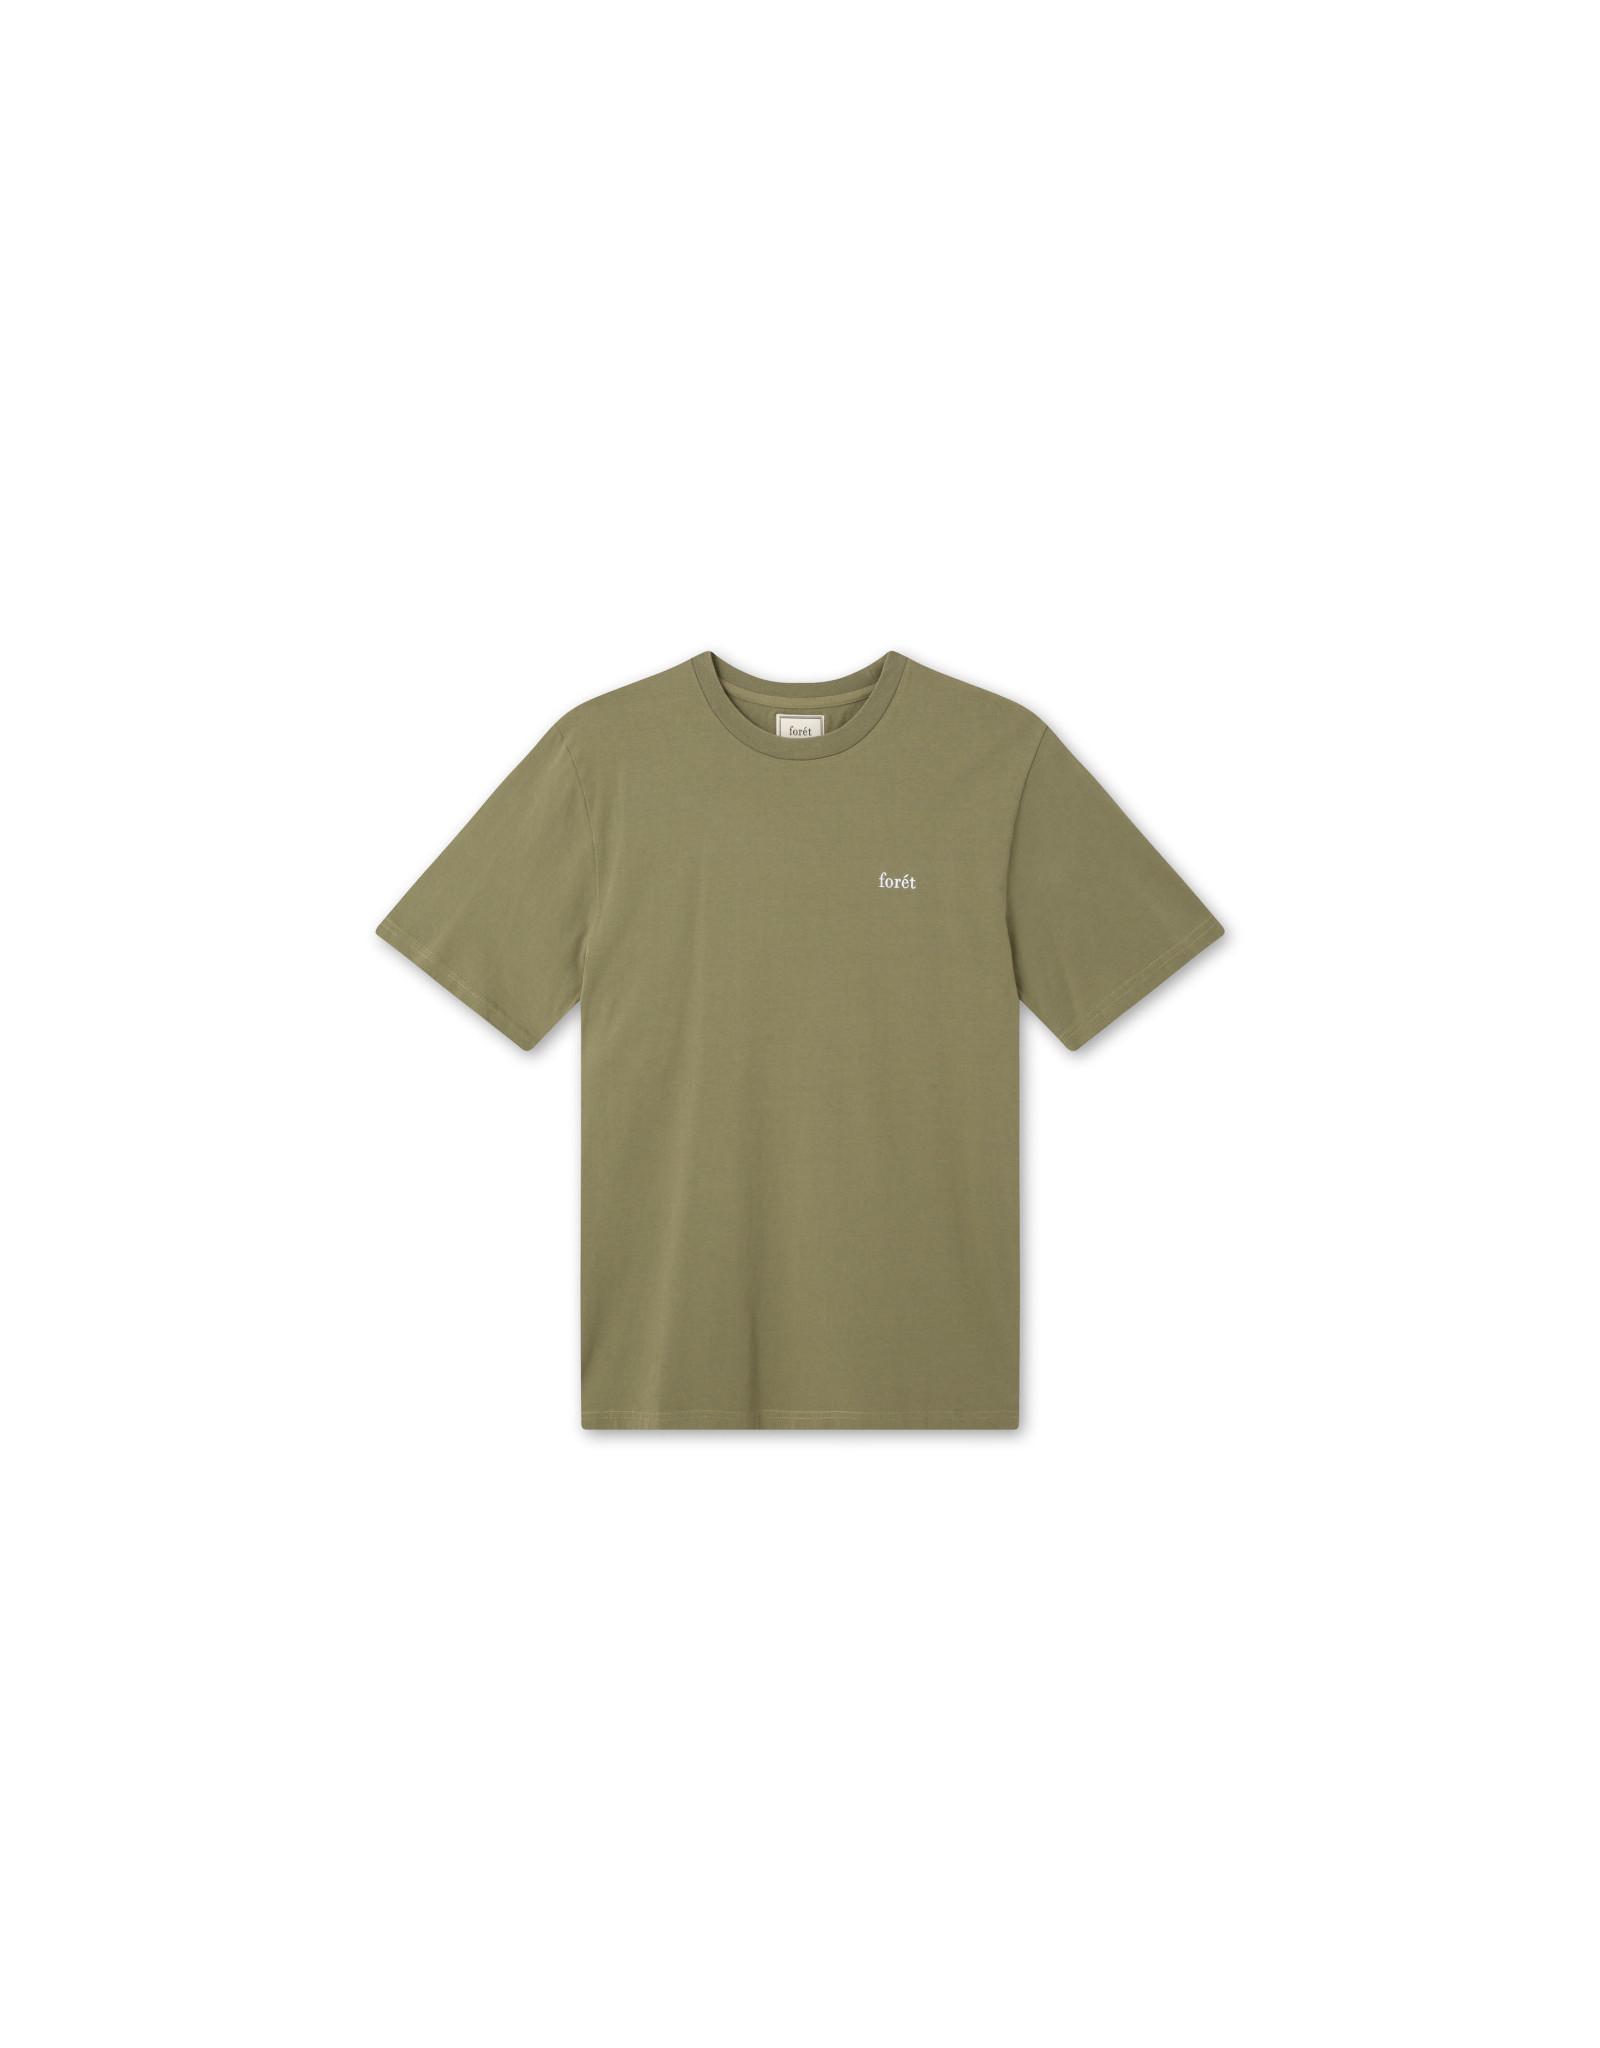 Forét Air T-Shirt